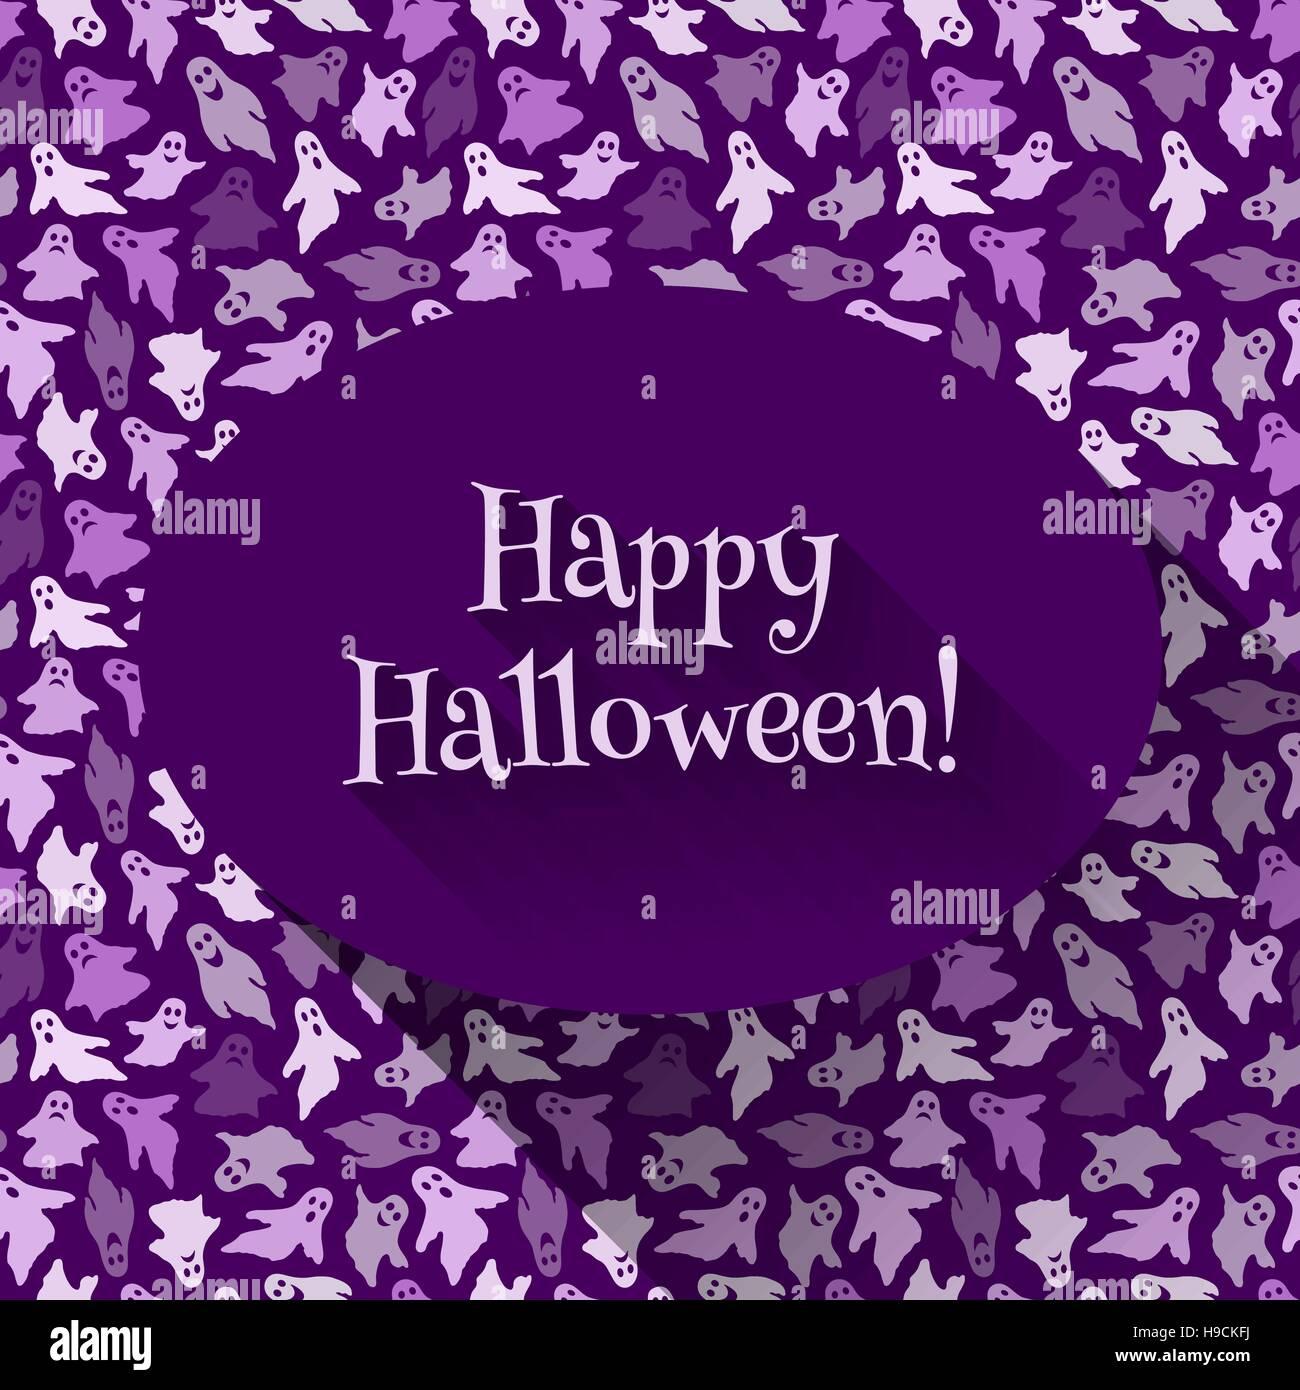 halloween elements photos & halloween elements images - alamy